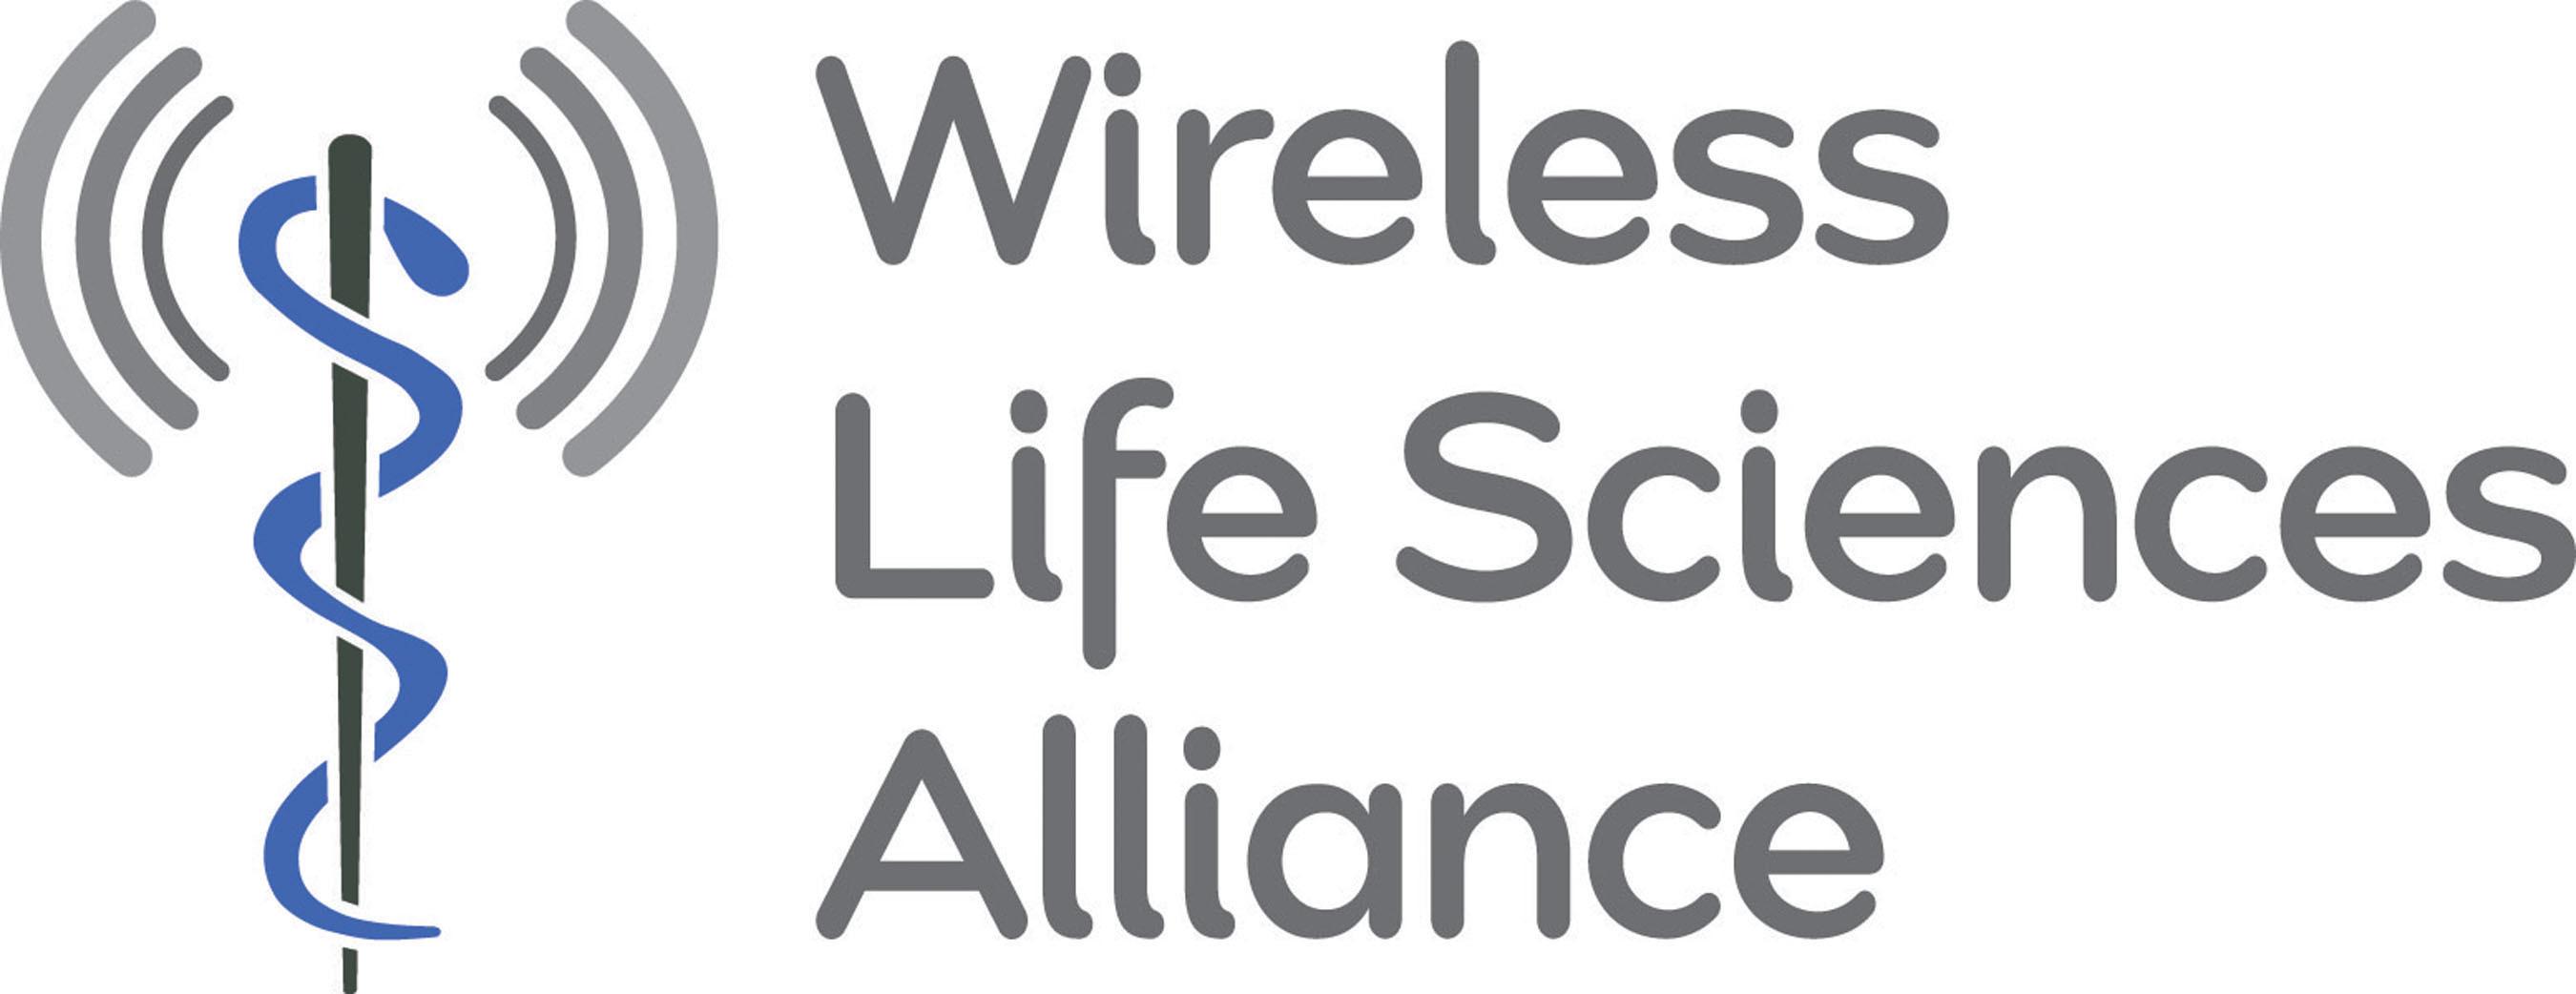 Wireless-Life Sciences Alliance Logo.